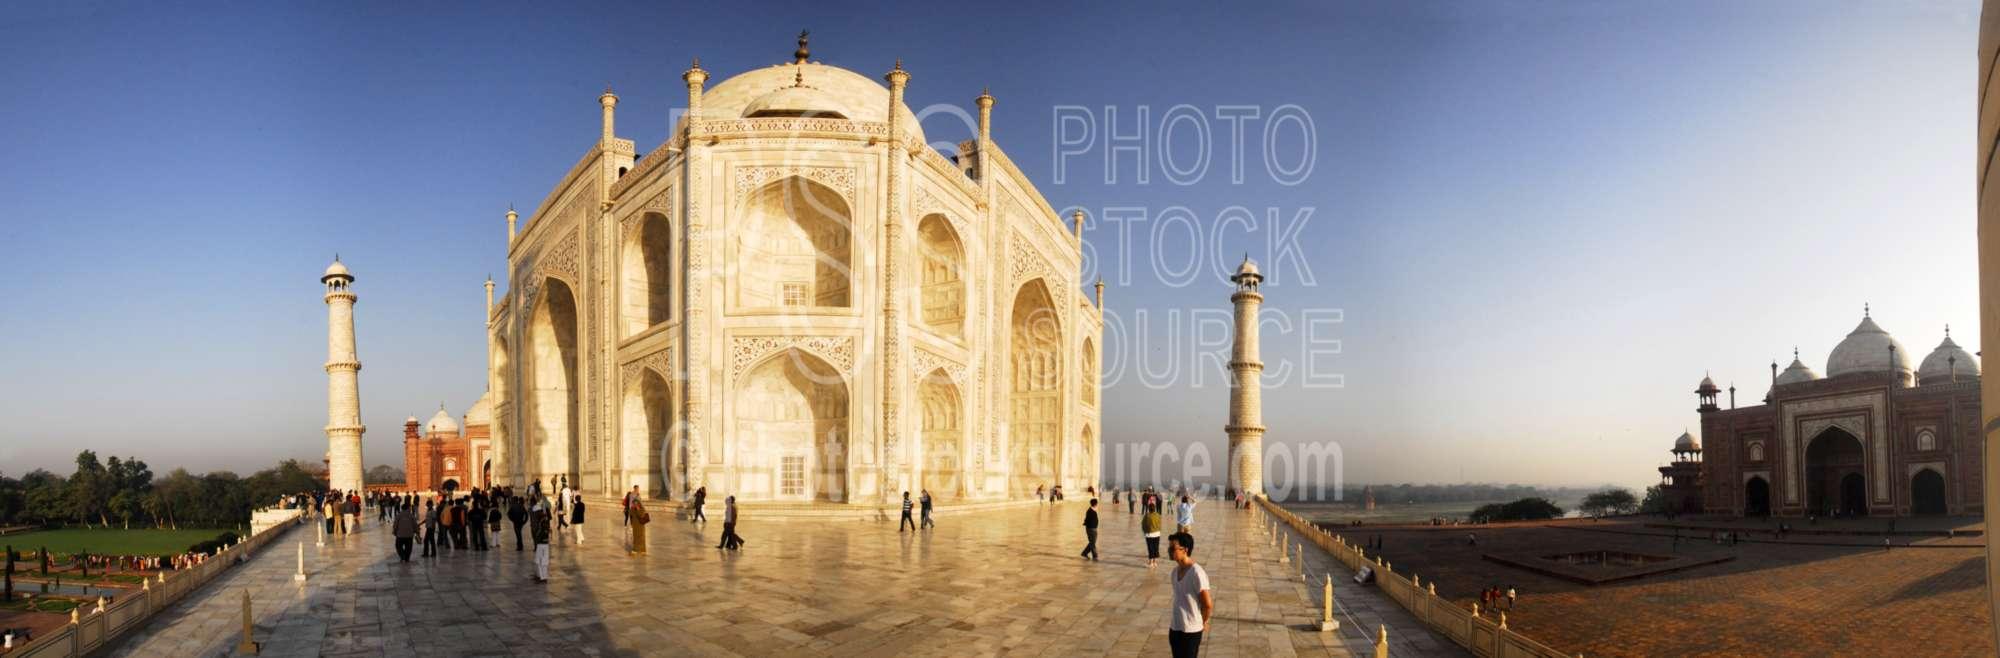 Taj Mahal Main Entrance